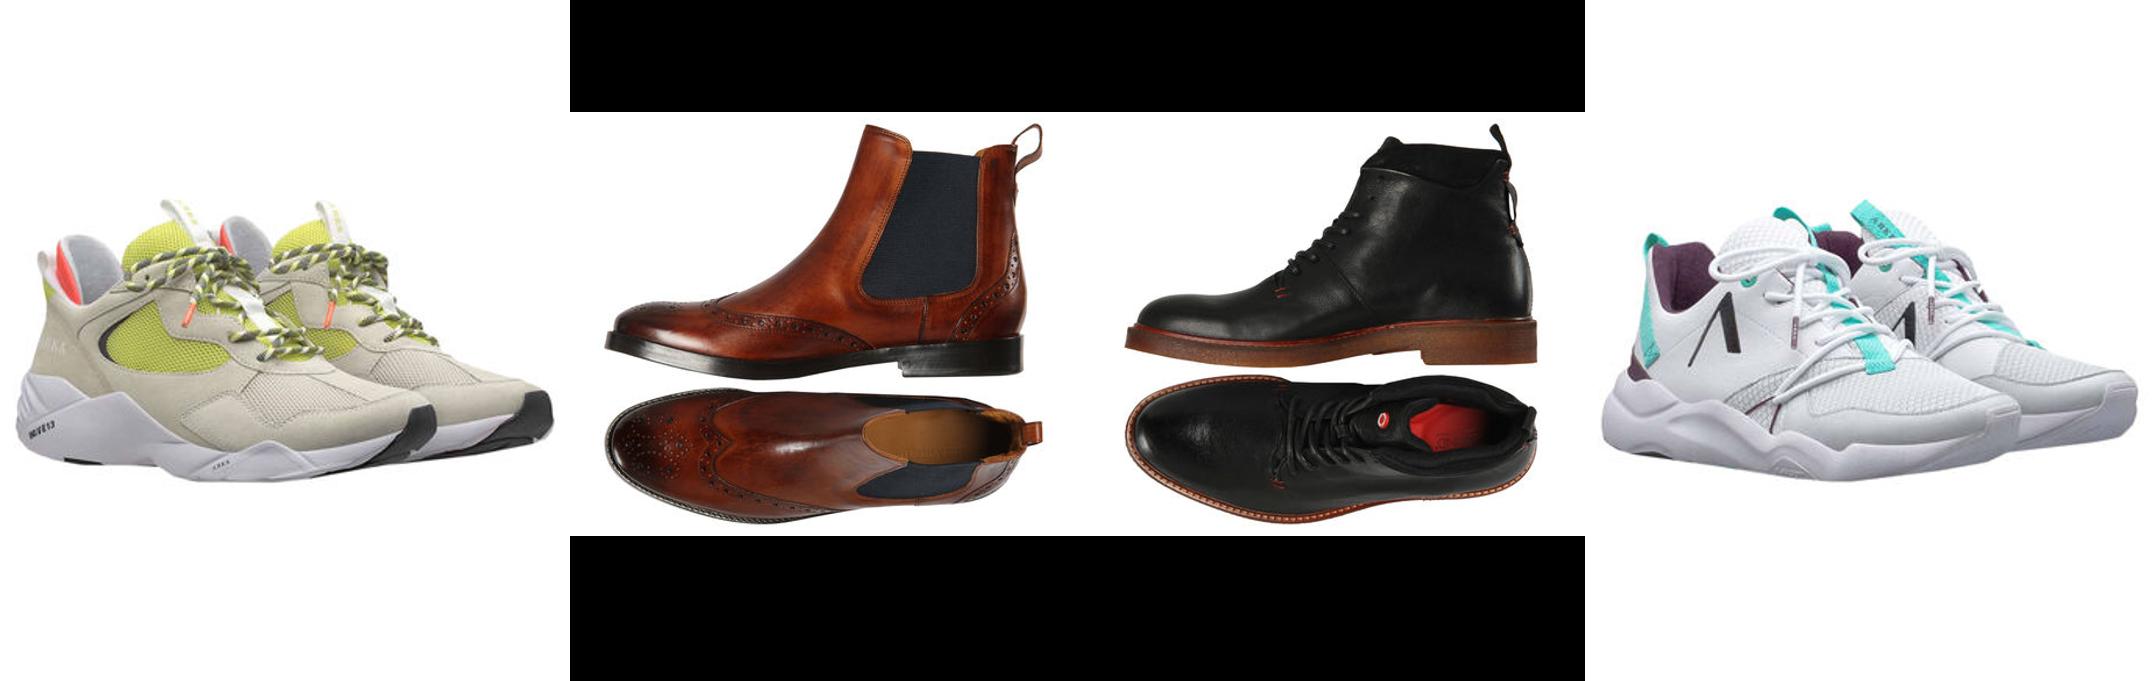 Modesünden - Schuhe